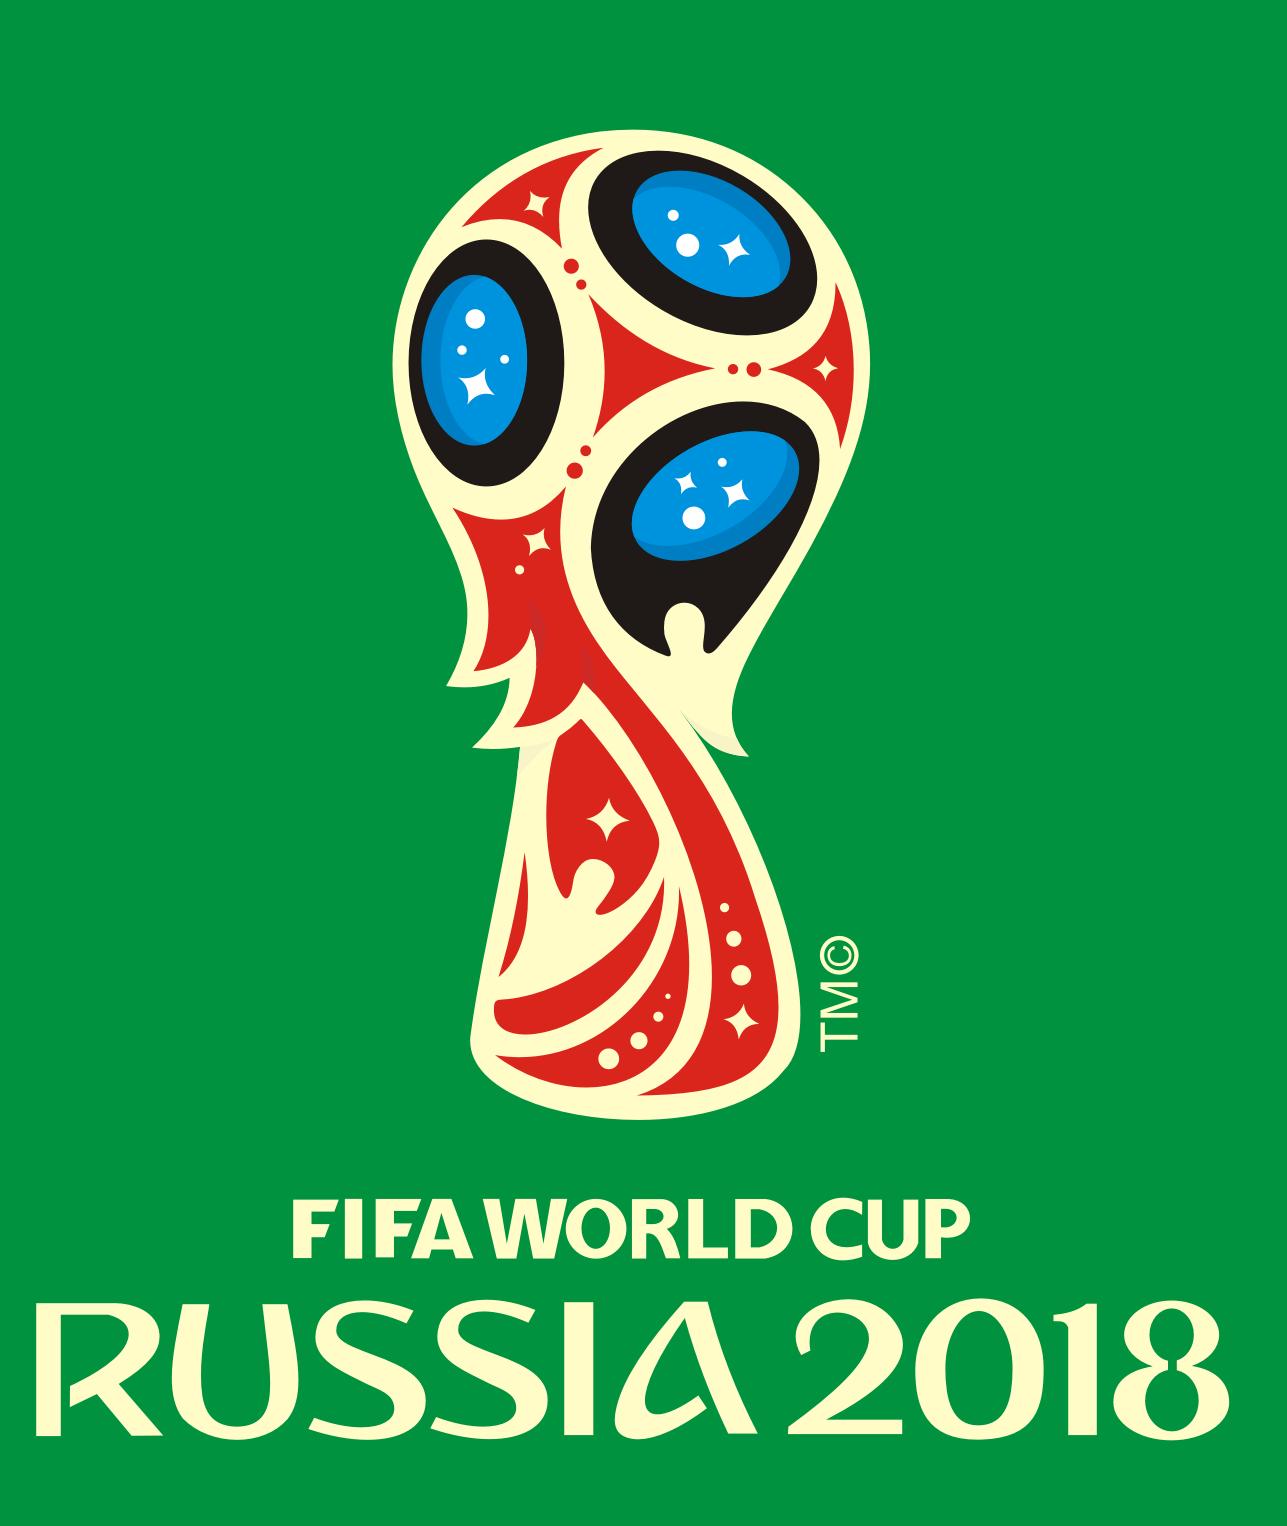 Logo Resmi Fifa World Cup Russia 2018 Free Vector CDR